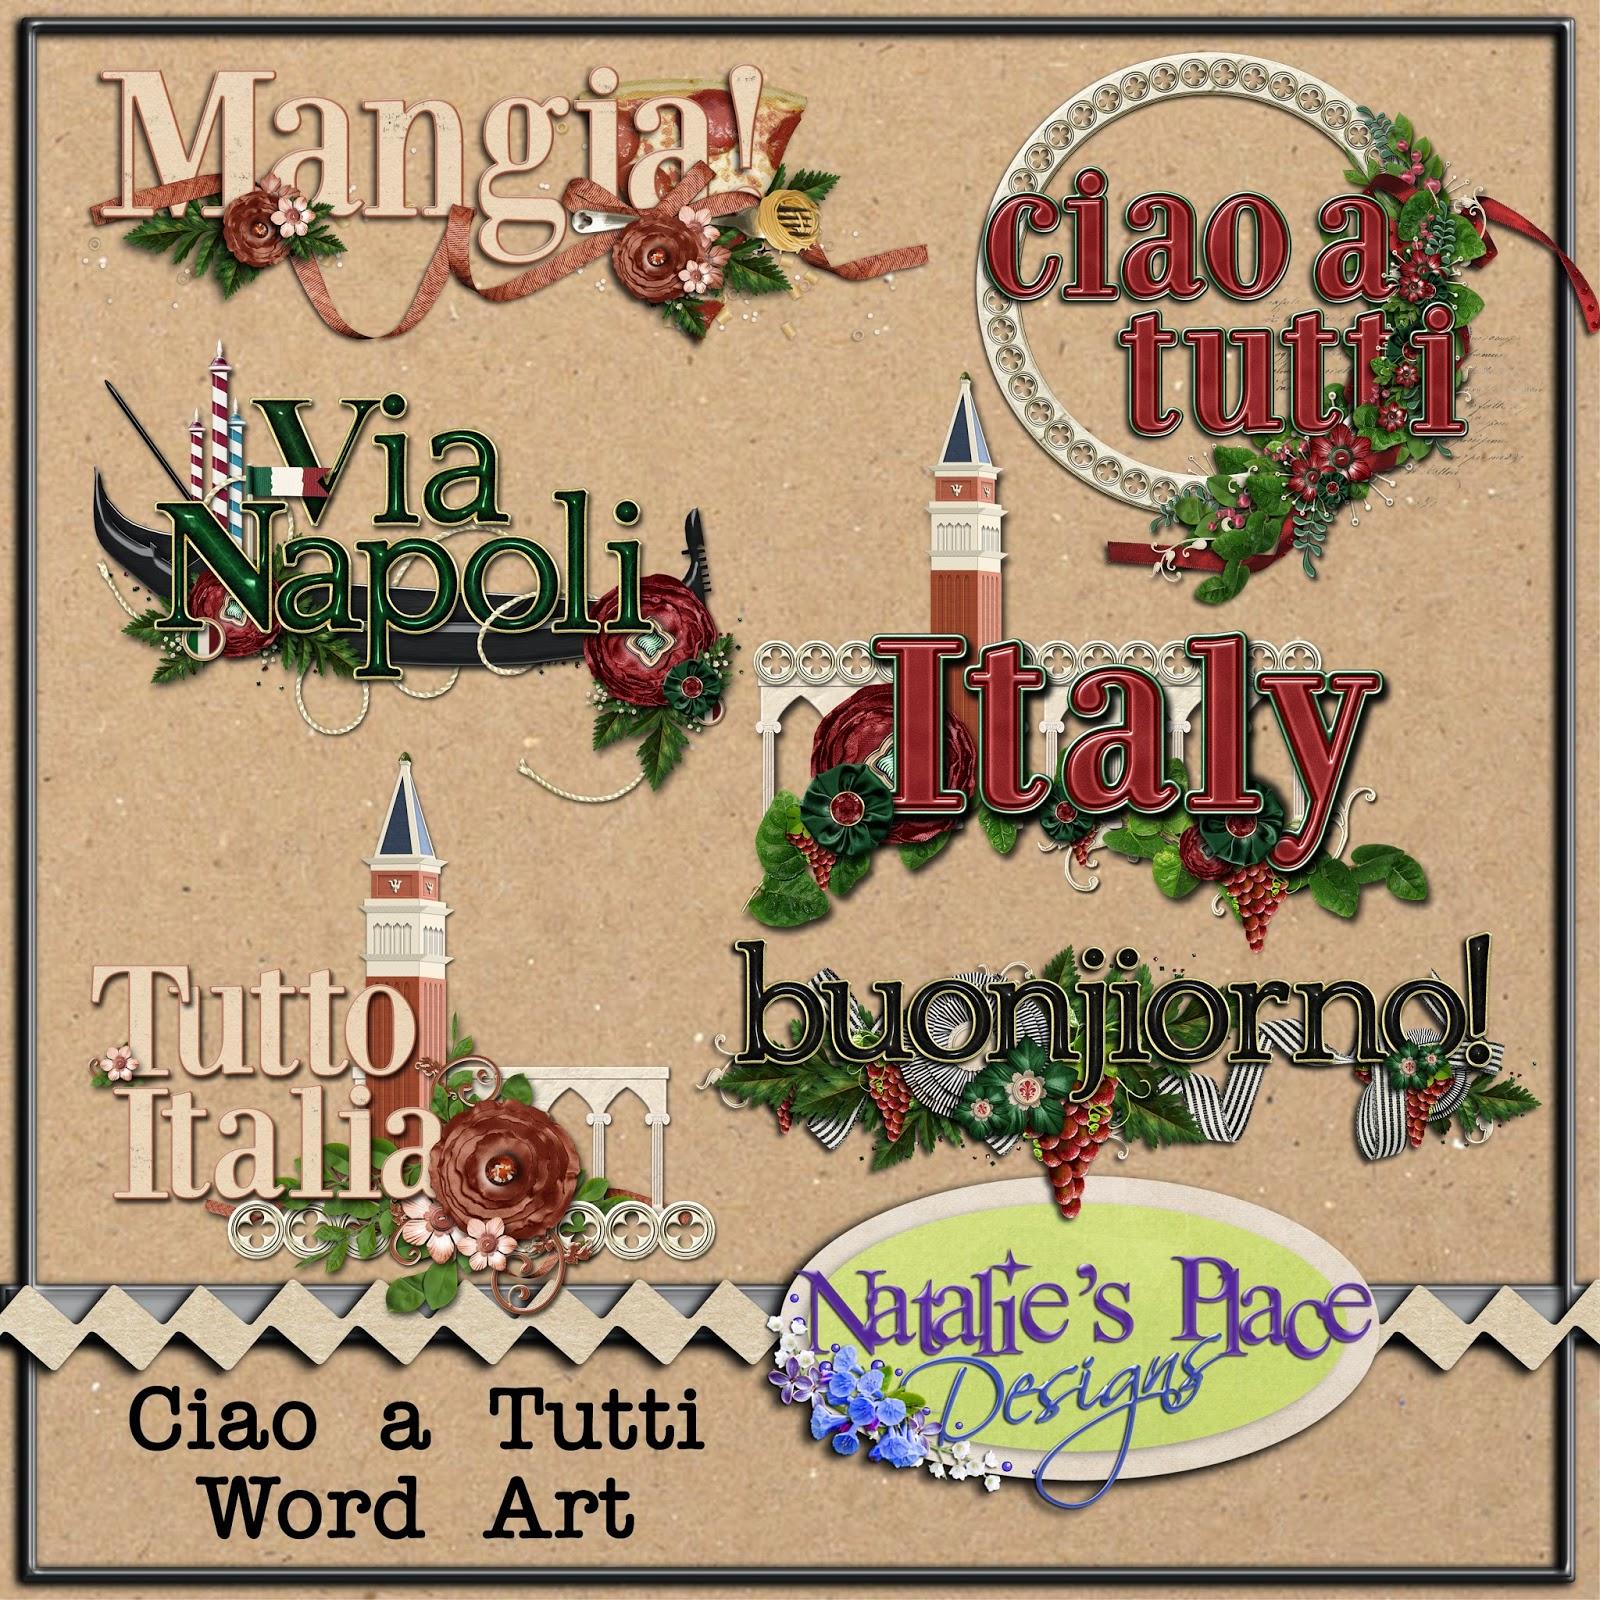 http://natalieslittlecorneroftheworld.blogspot.com/2014/09/bella-italia.html